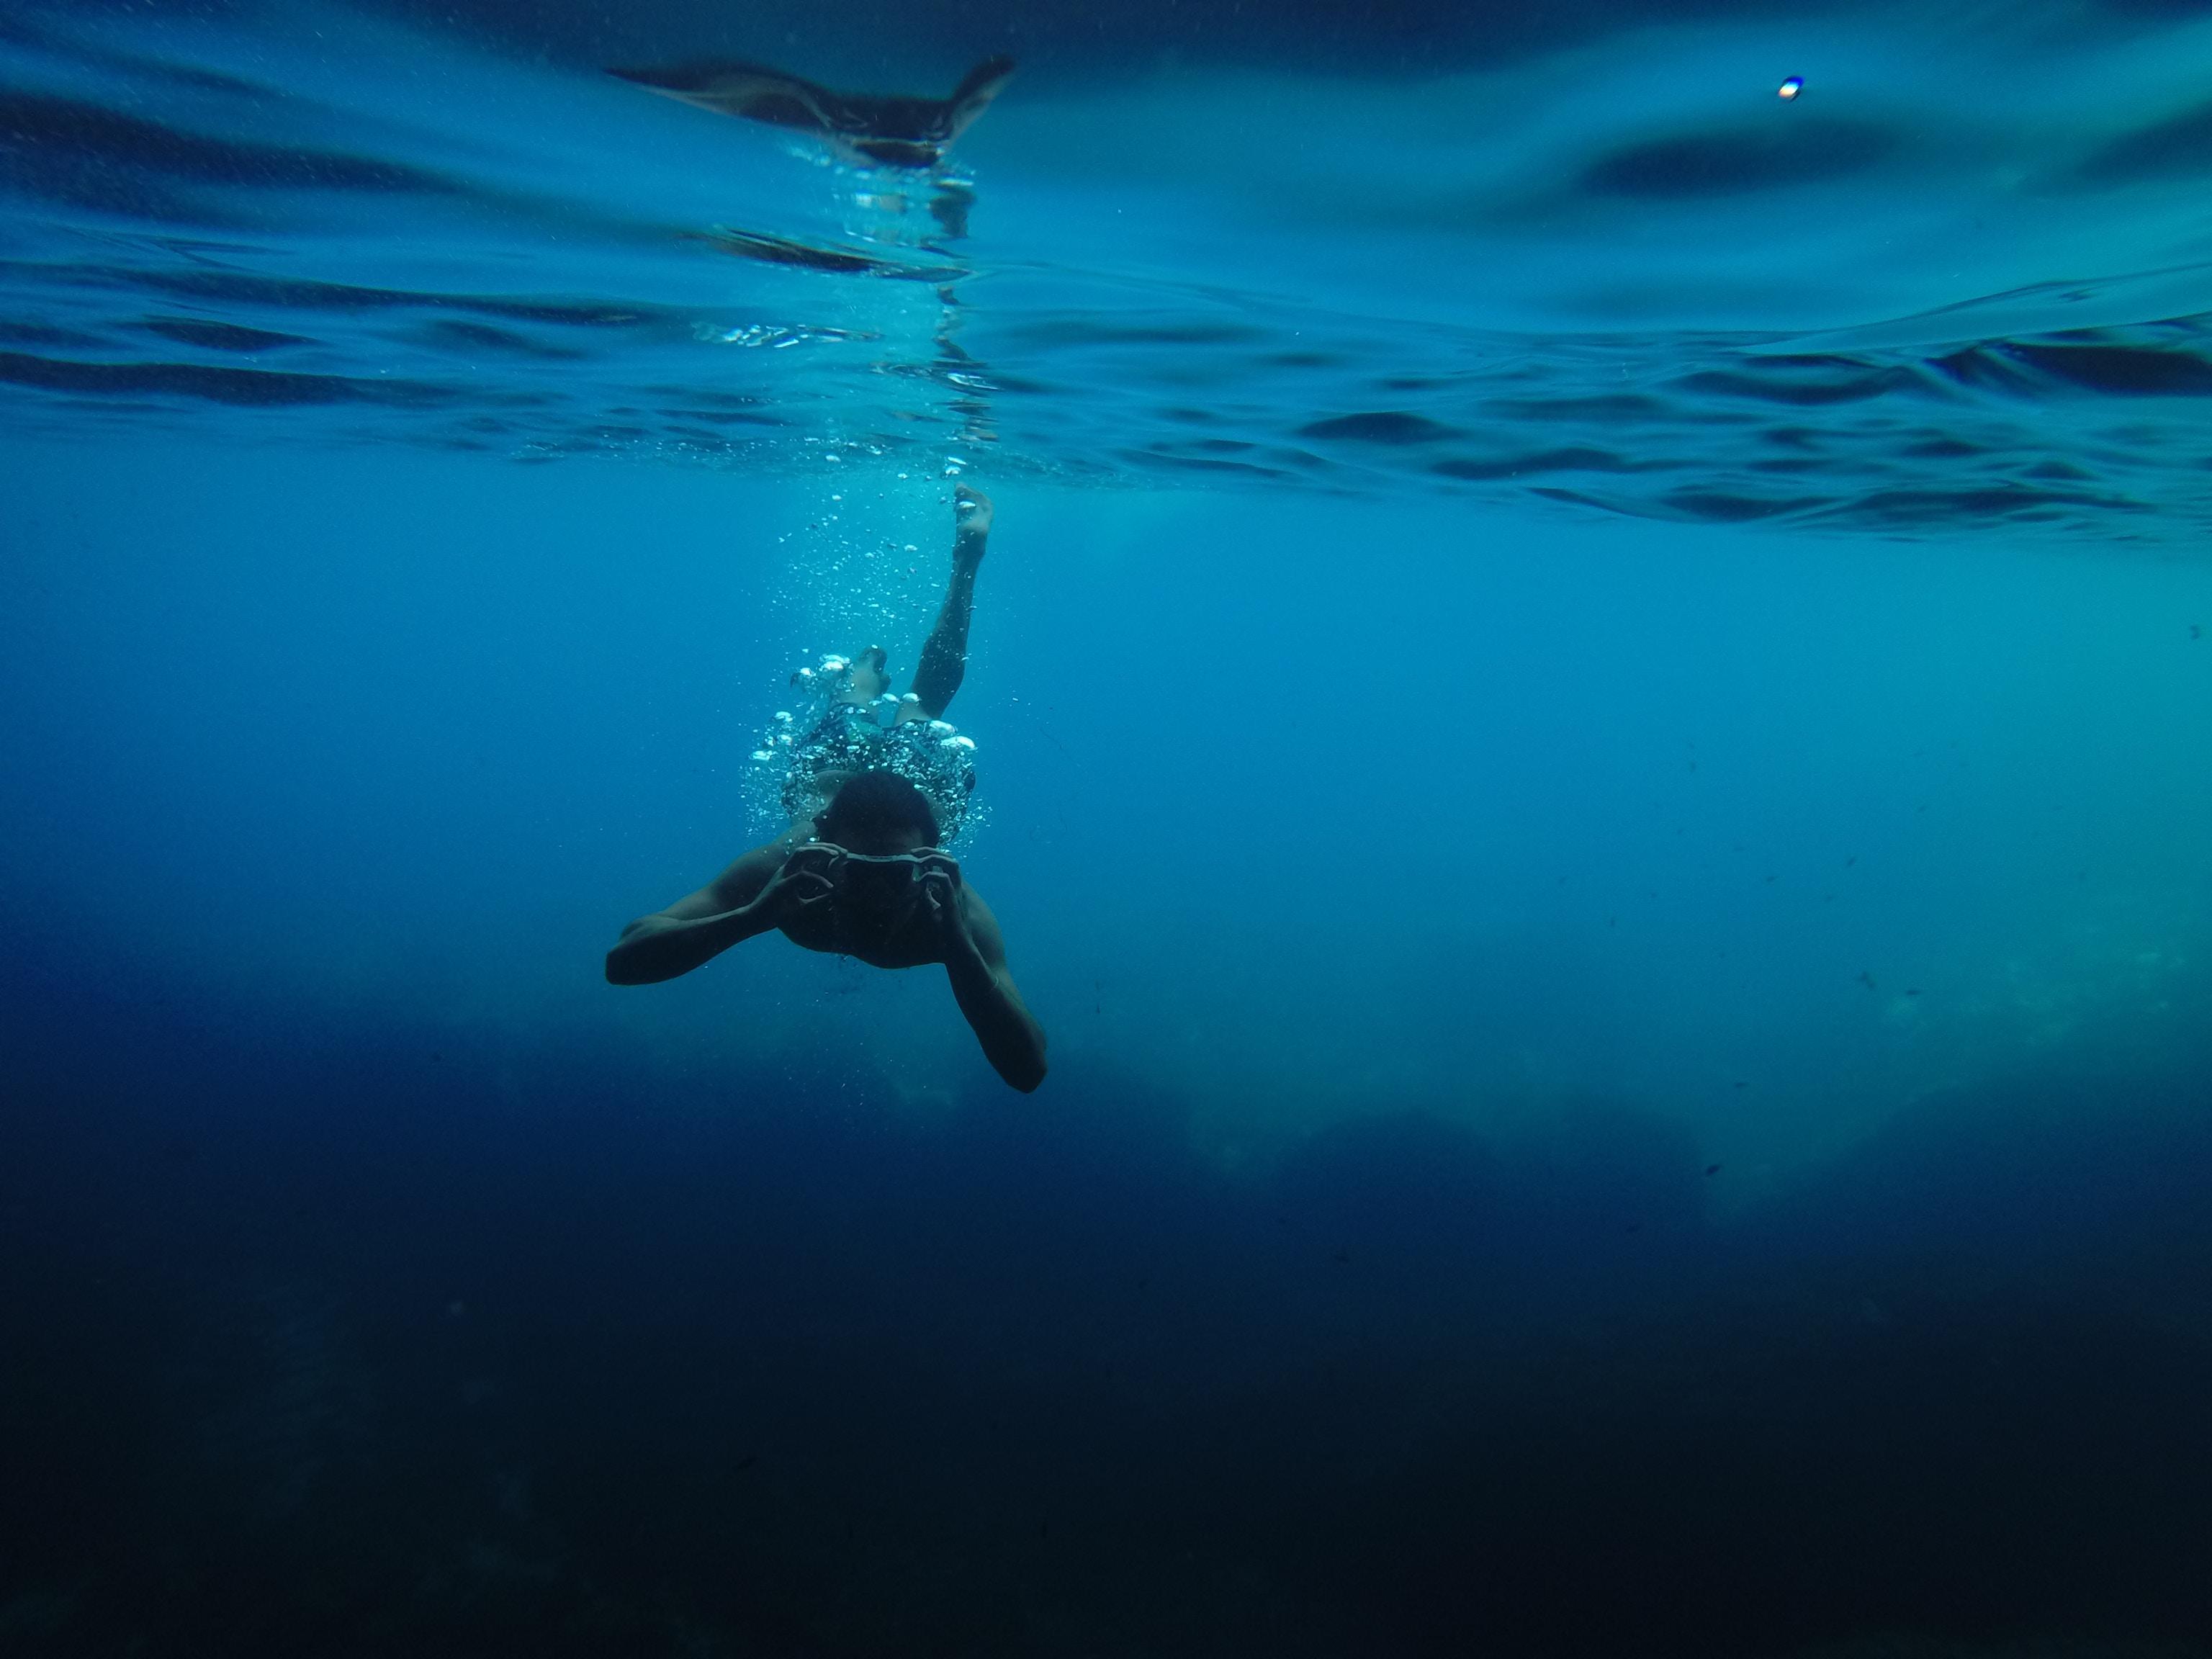 Underwater Hvar